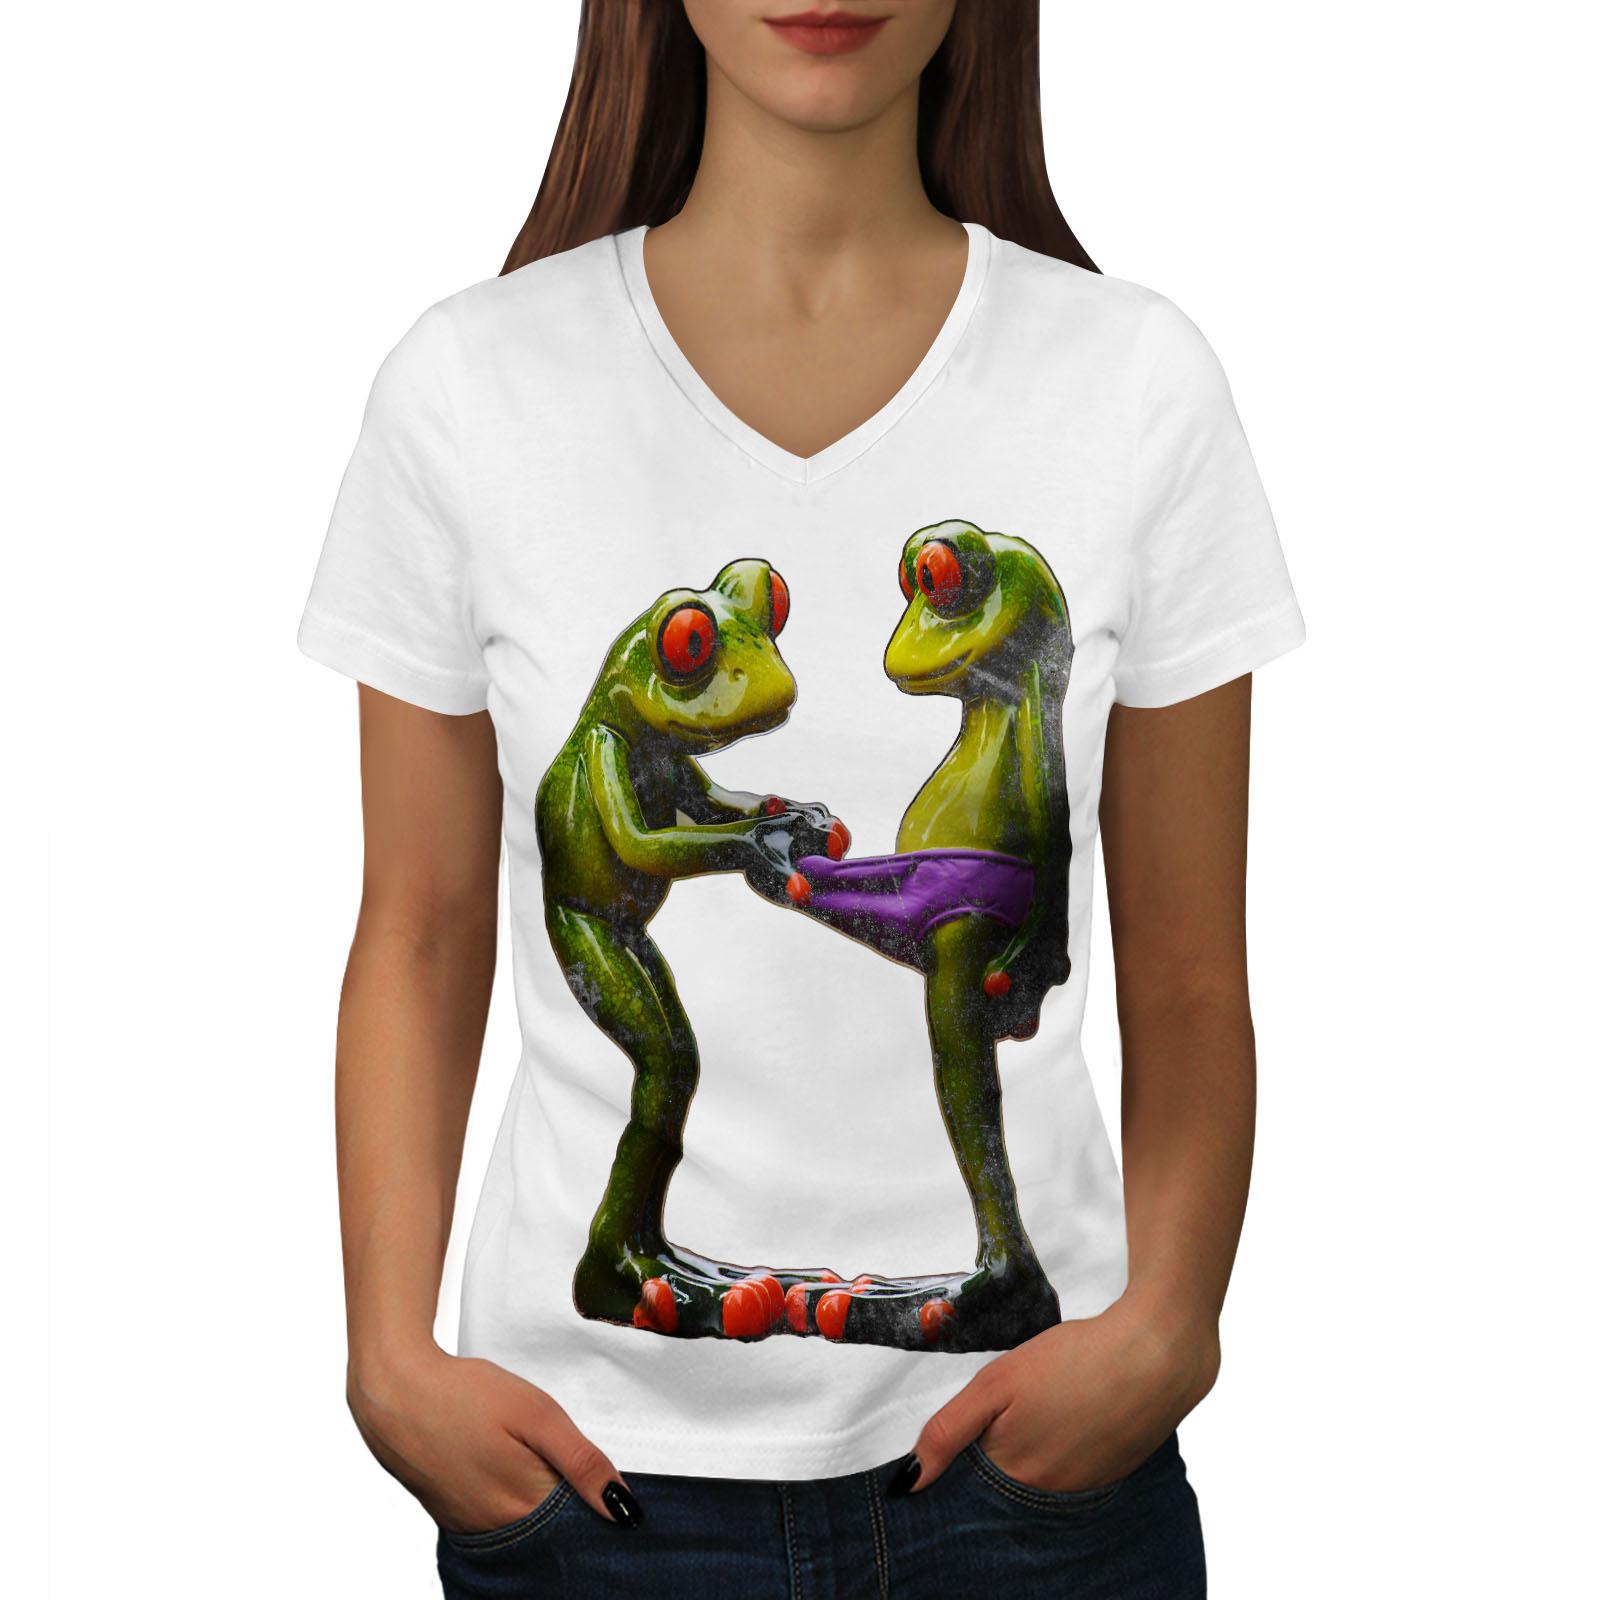 Wellcoda-RANE-Cool-scherzo-da-Donna-V-Neck-T-shirt-Biancheria-Intima-Design-Grafico-Tee miniatura 7